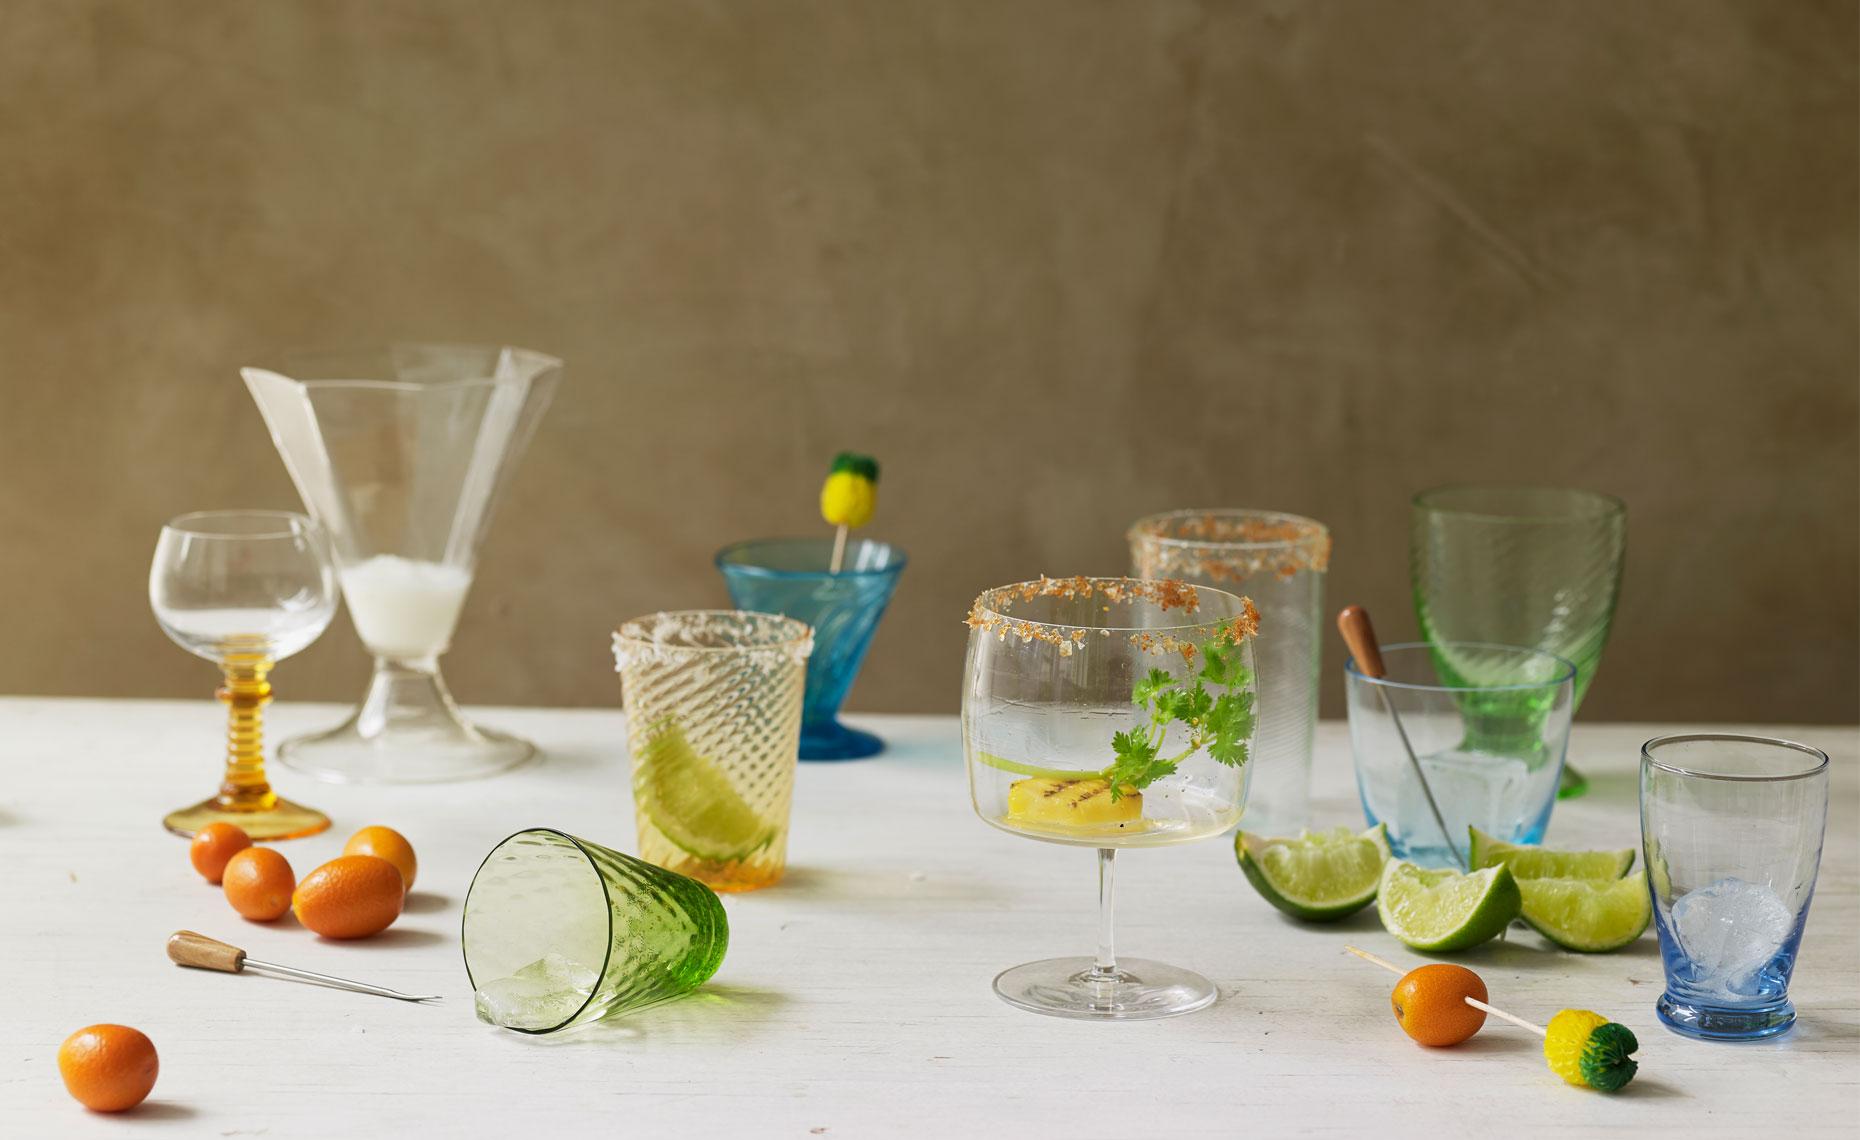 mexican-drink-spread-resized.jpg